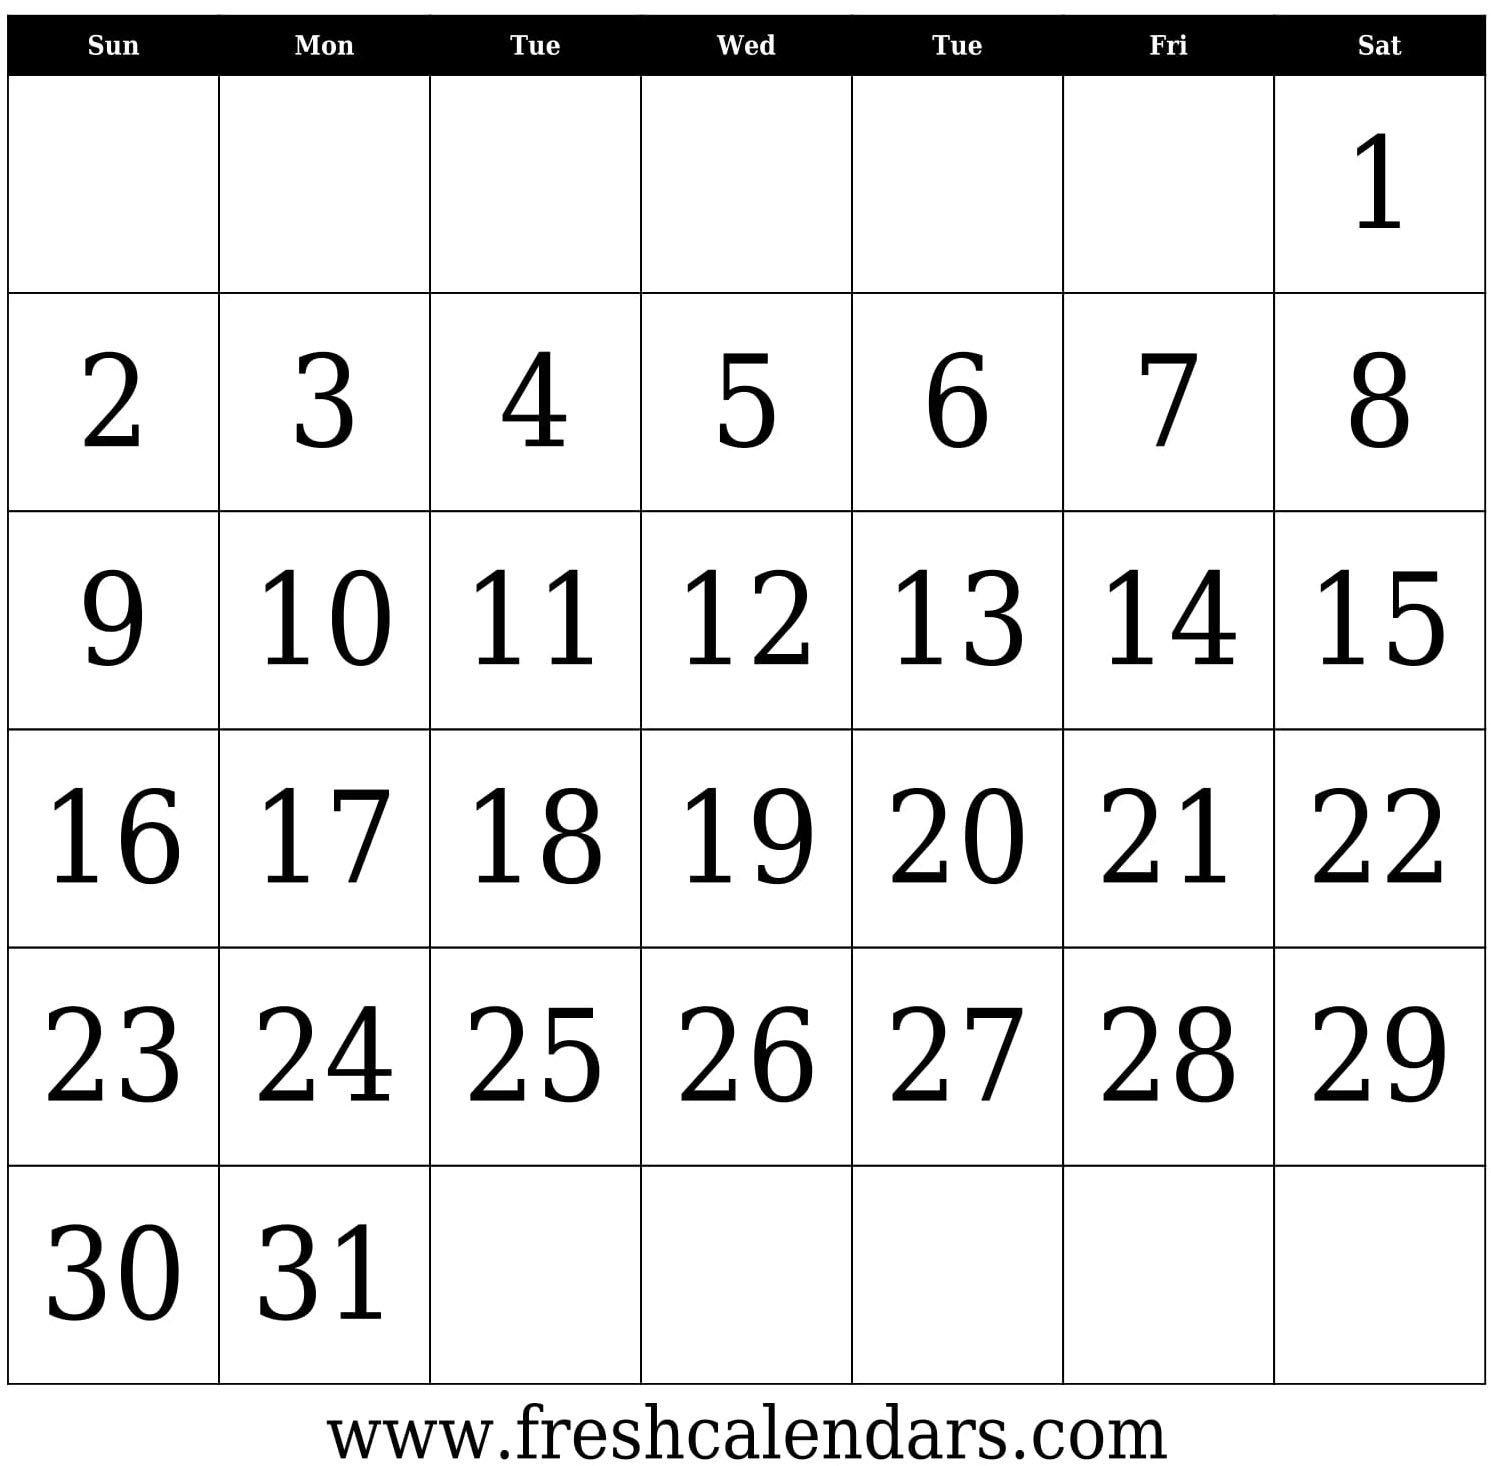 Free Printable 2020 Calendar | Calendar Template, Blank Blank 31 Day Calendar Where You Can